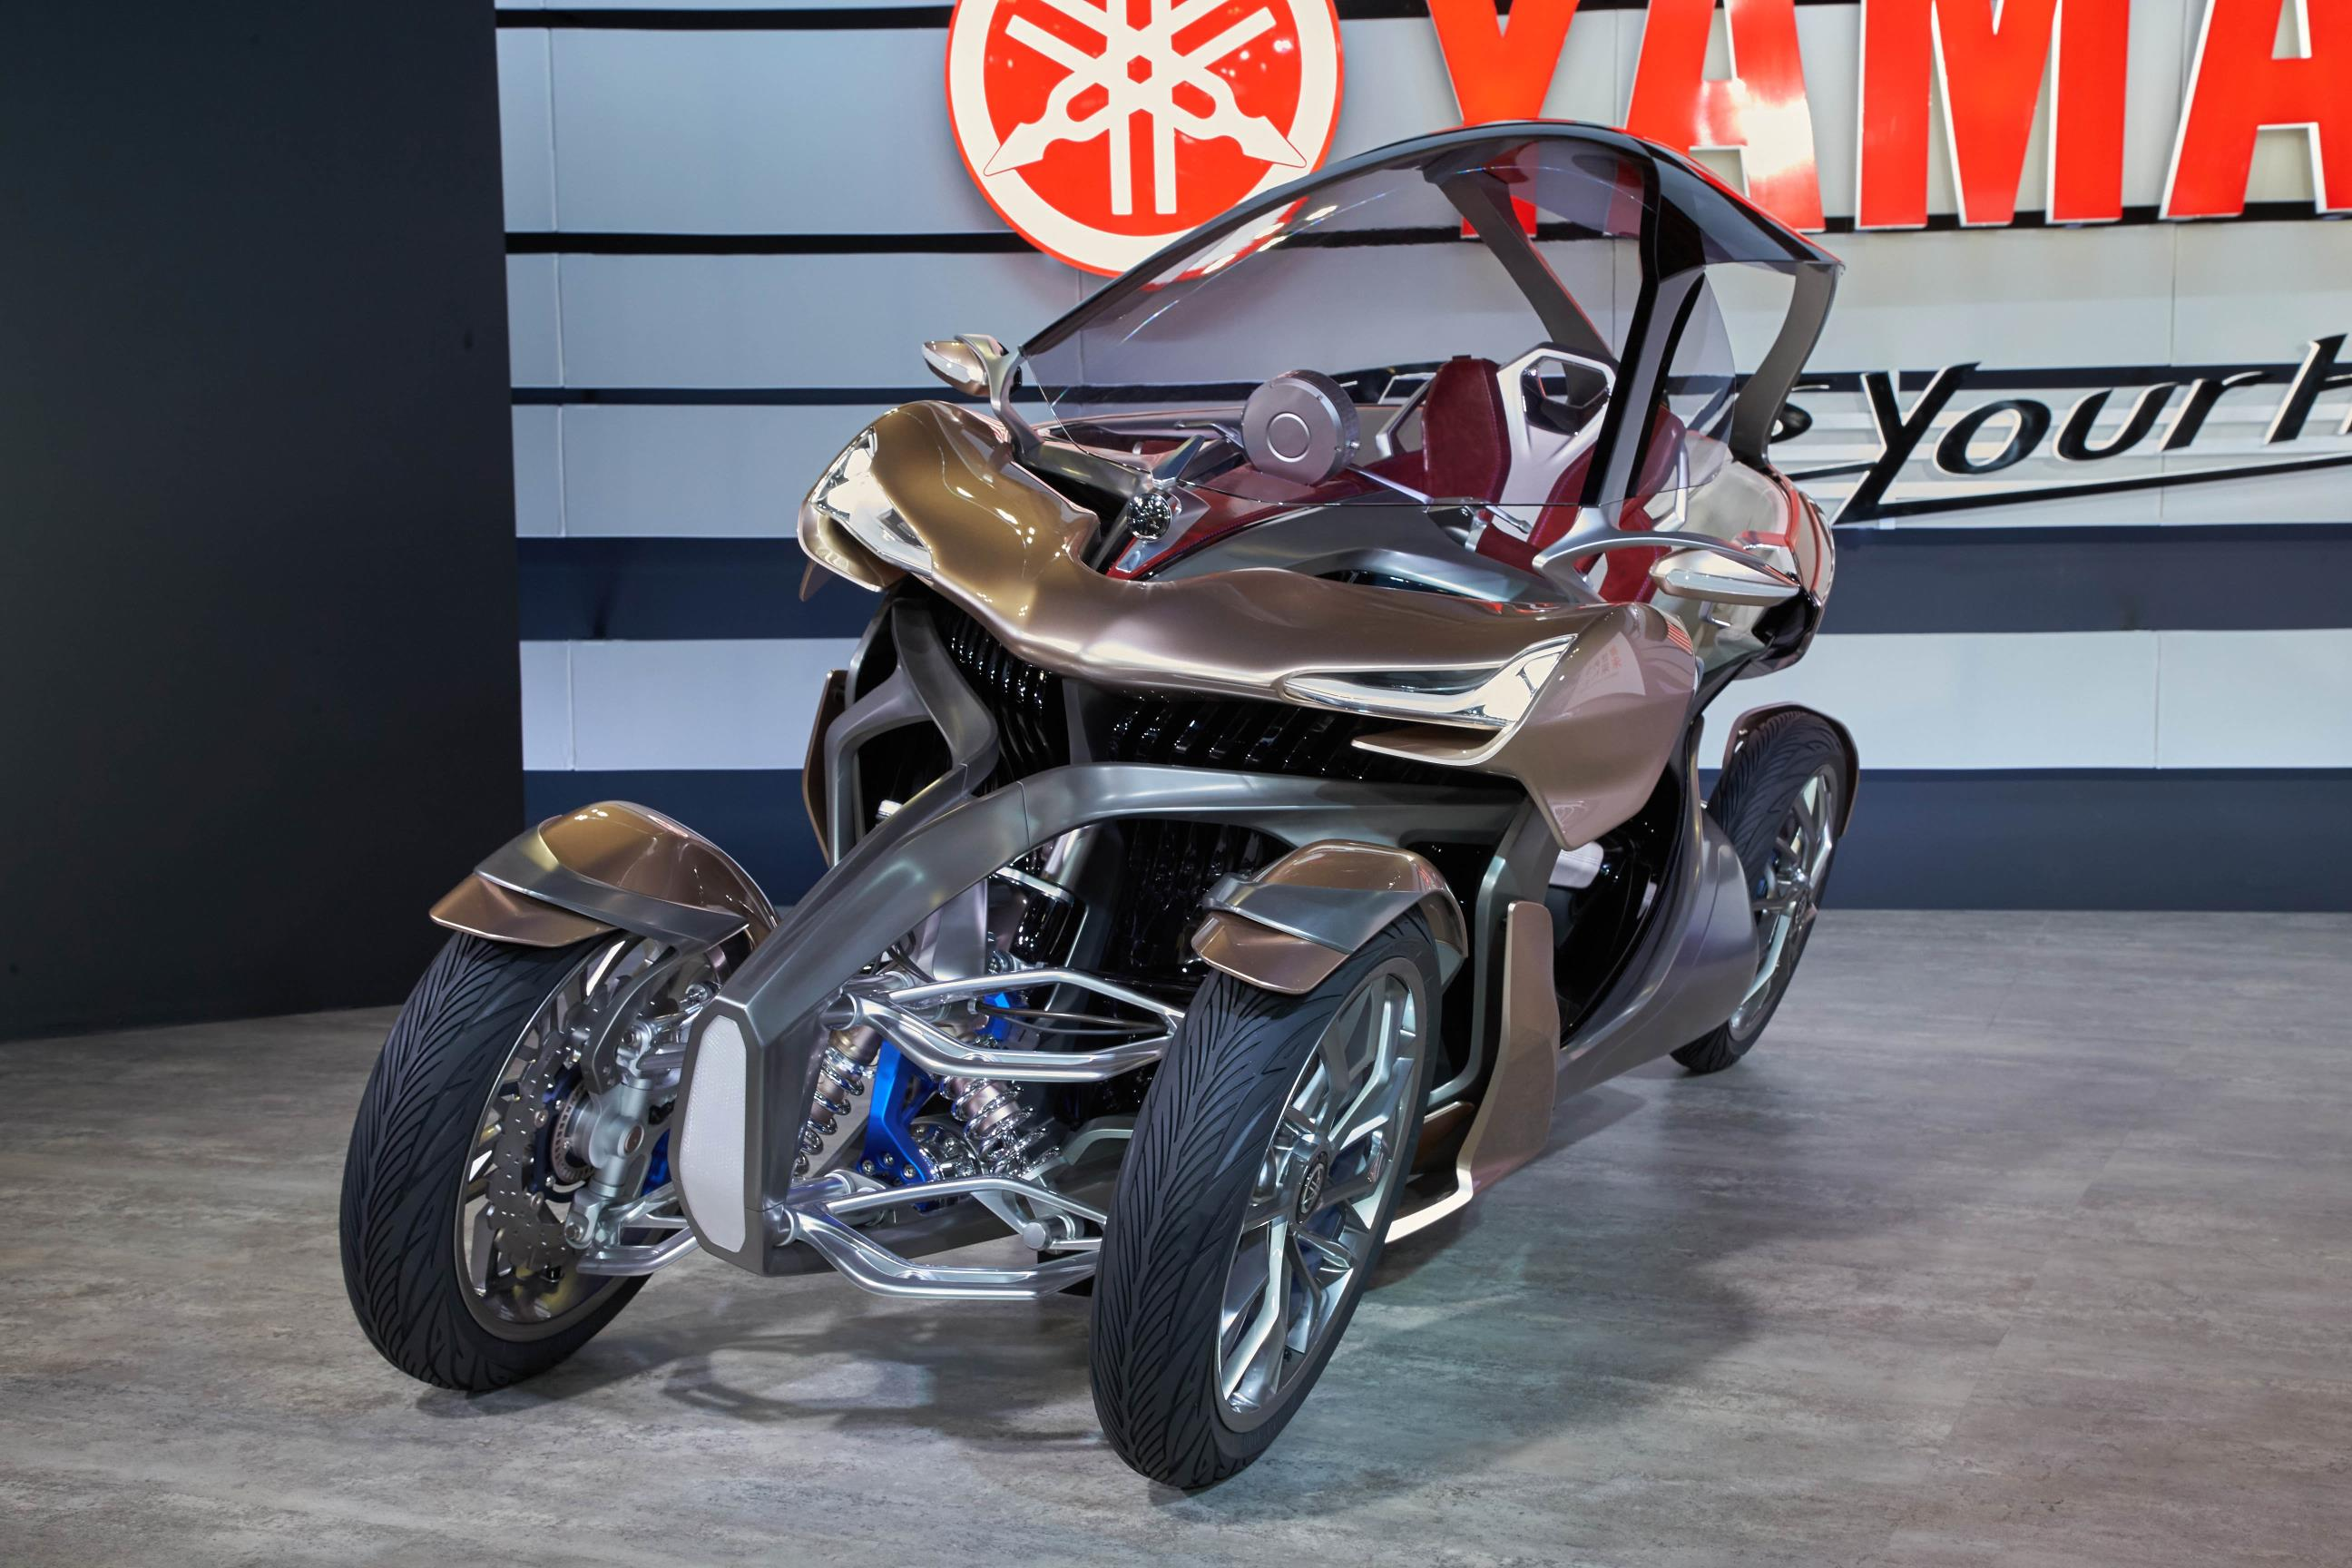 Tokyo motor show 2017 (283)